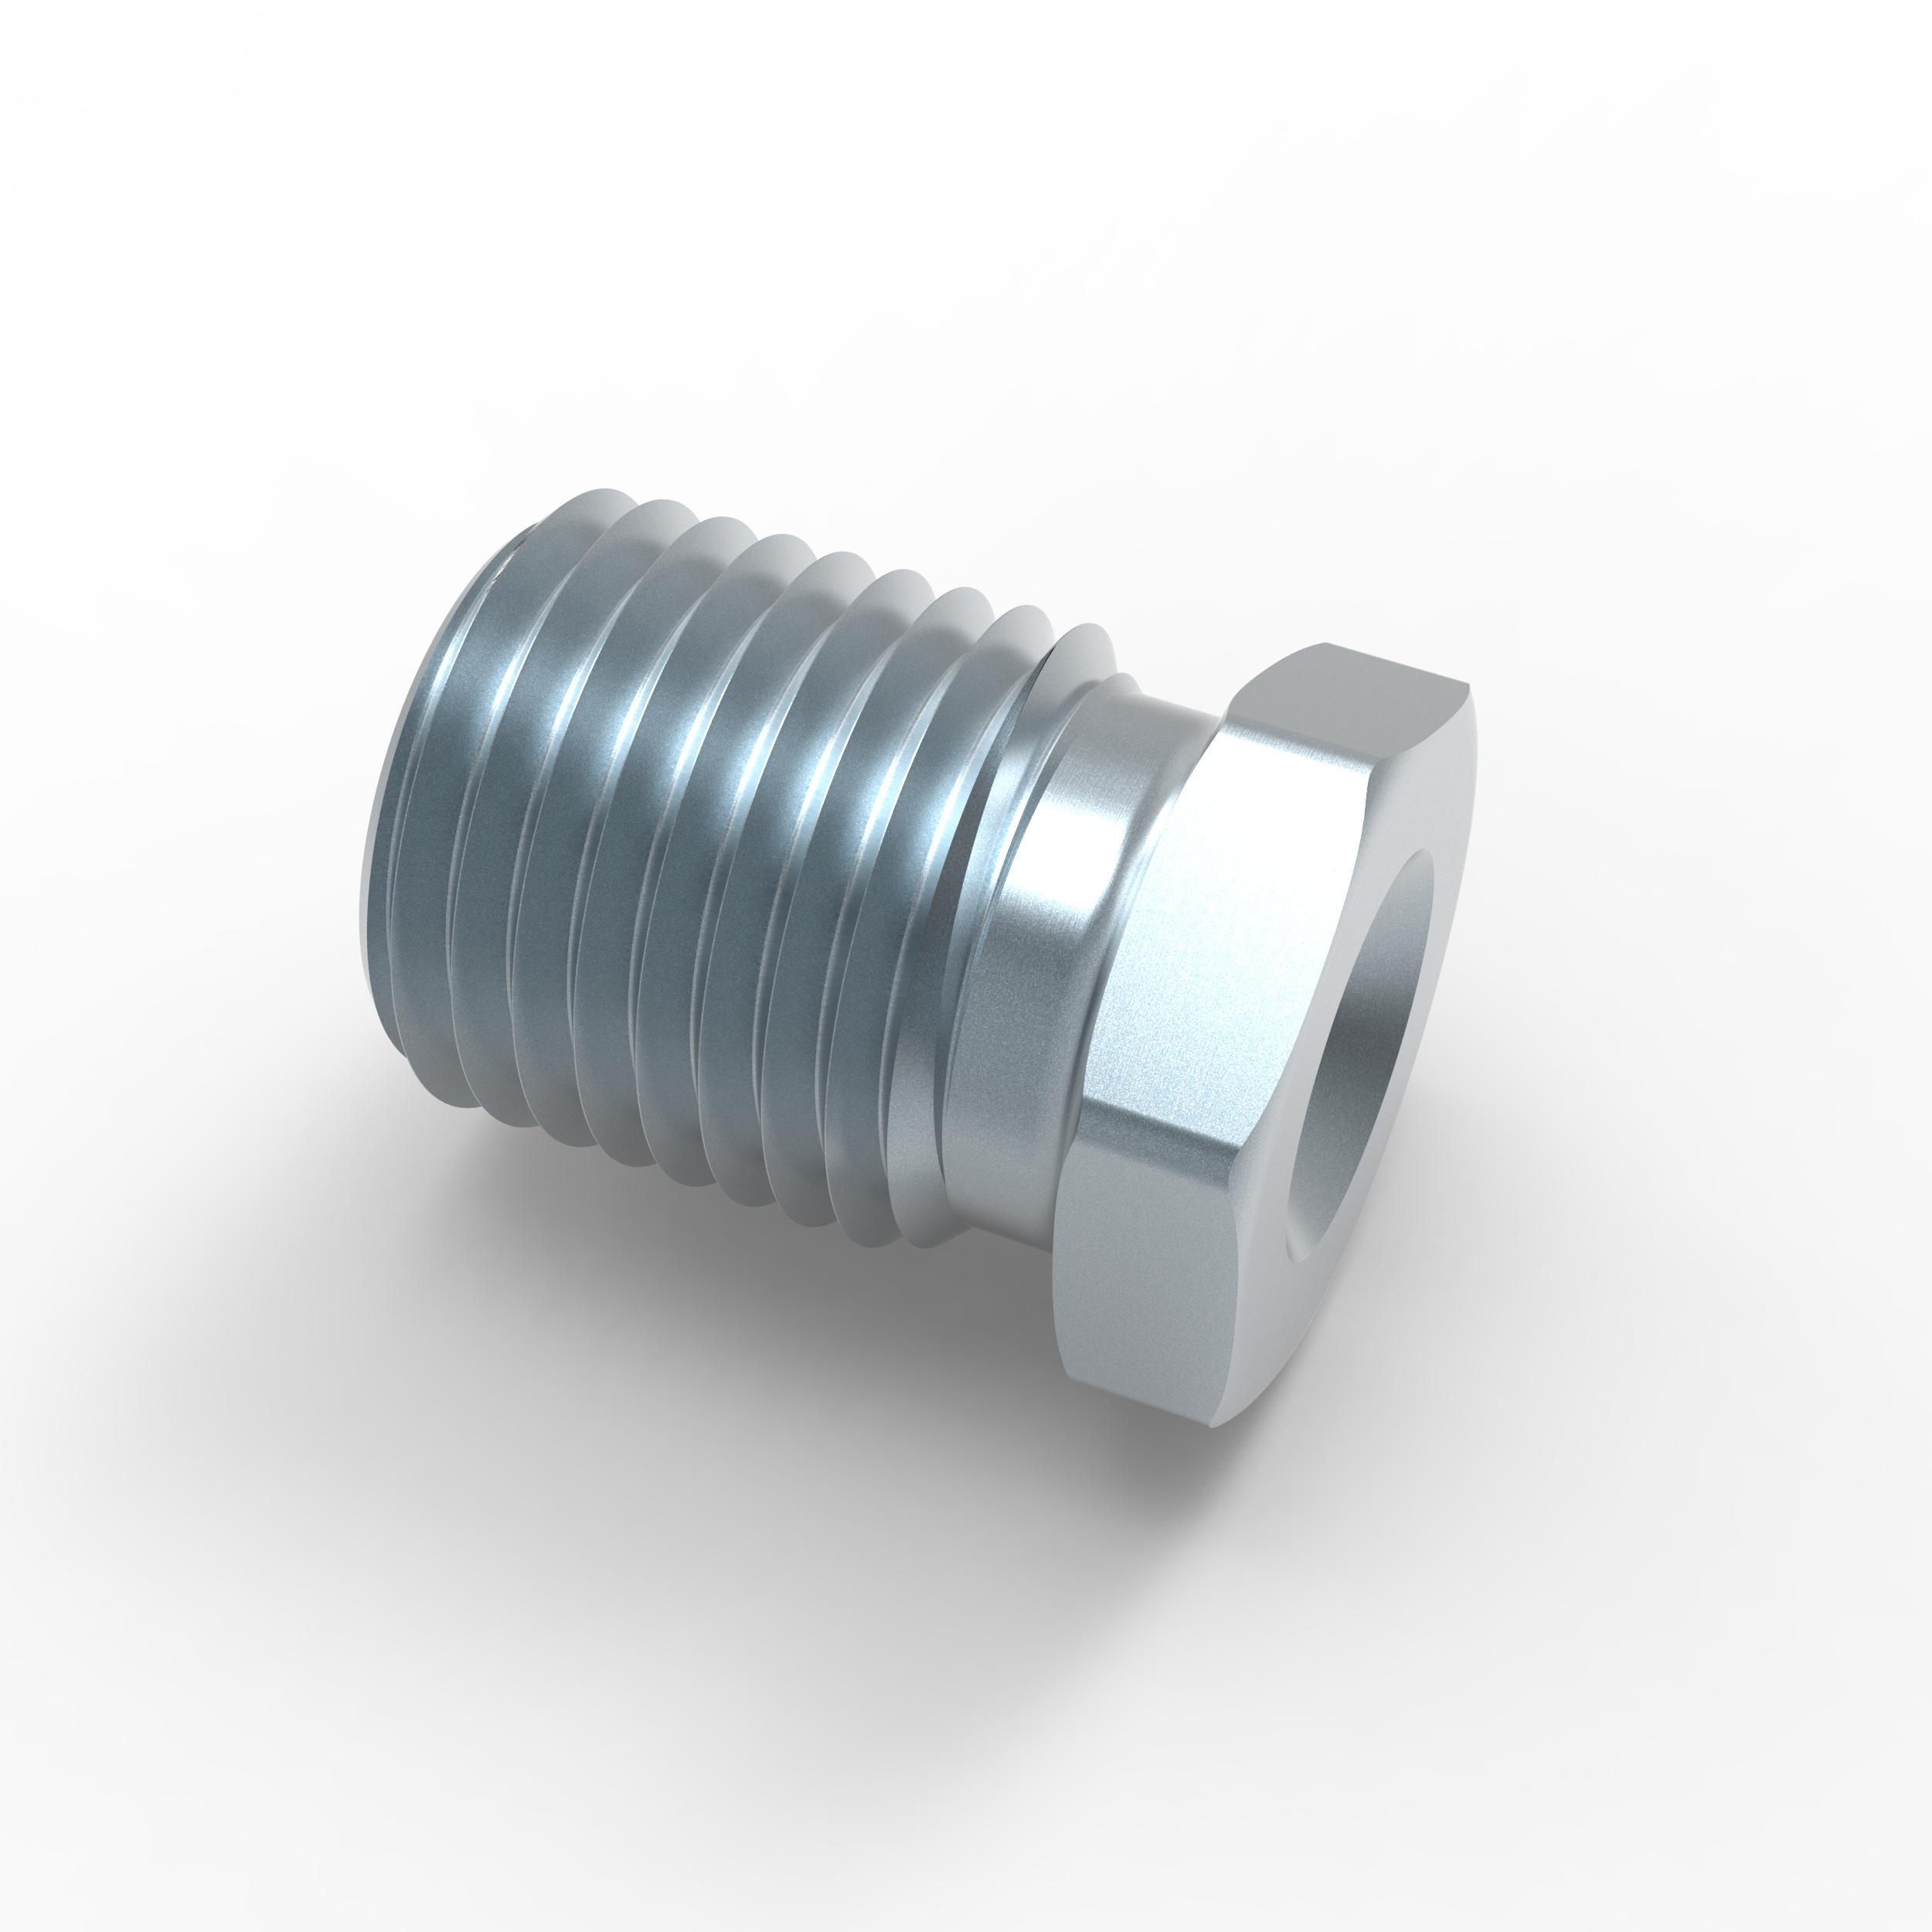 4x Verschraubung M10 x 1,25 f/ür Bremsleitung 4,75 mm B/ördel F Typ L Profi Verbinder DIN//ISO 1651 konform